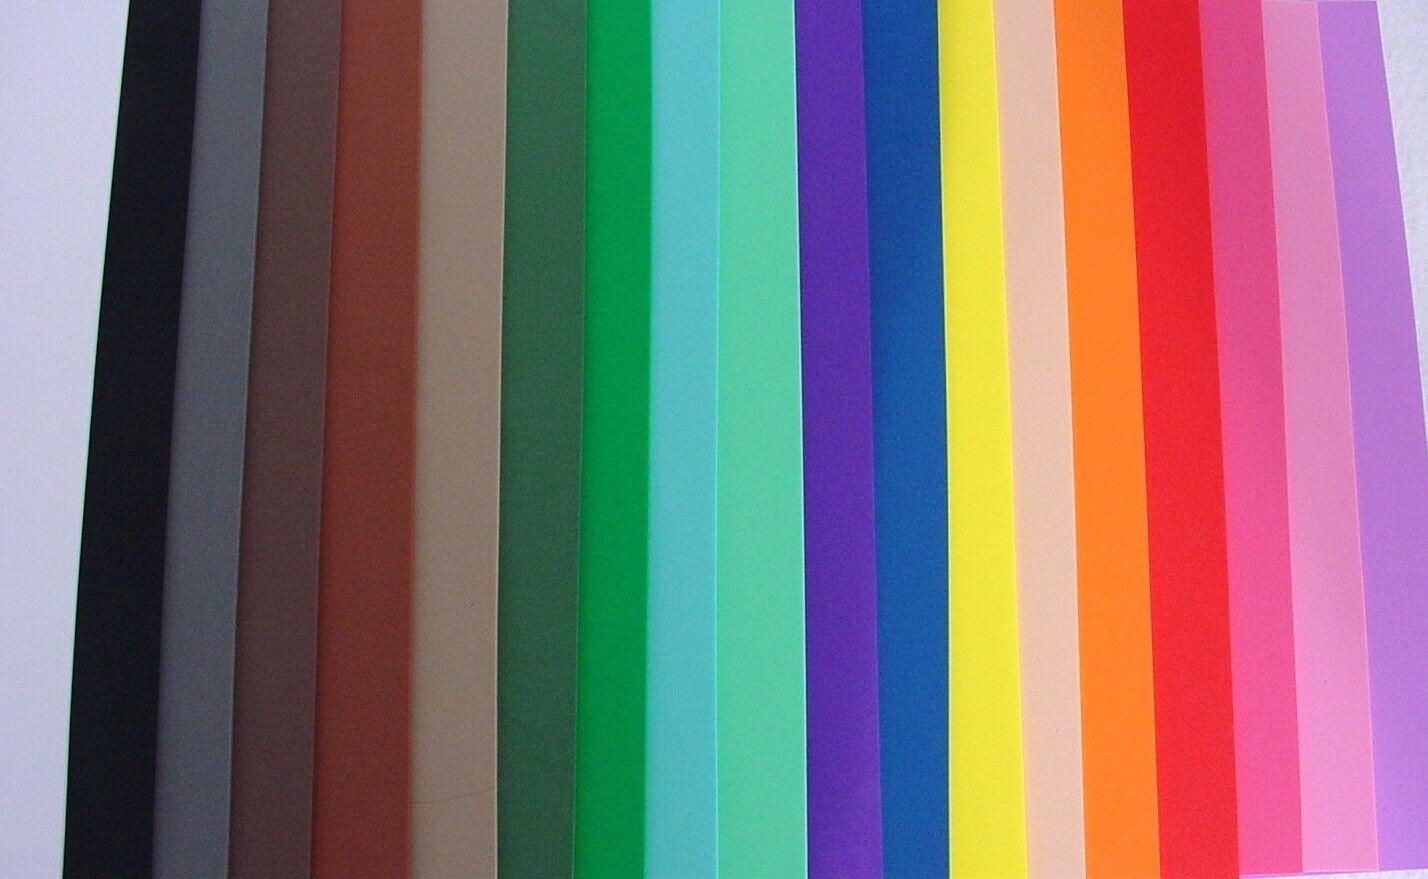 Moosgummiplatte 20 x 30 cm, 2 mm, Moosgummi 20 Farben zur Auswahl